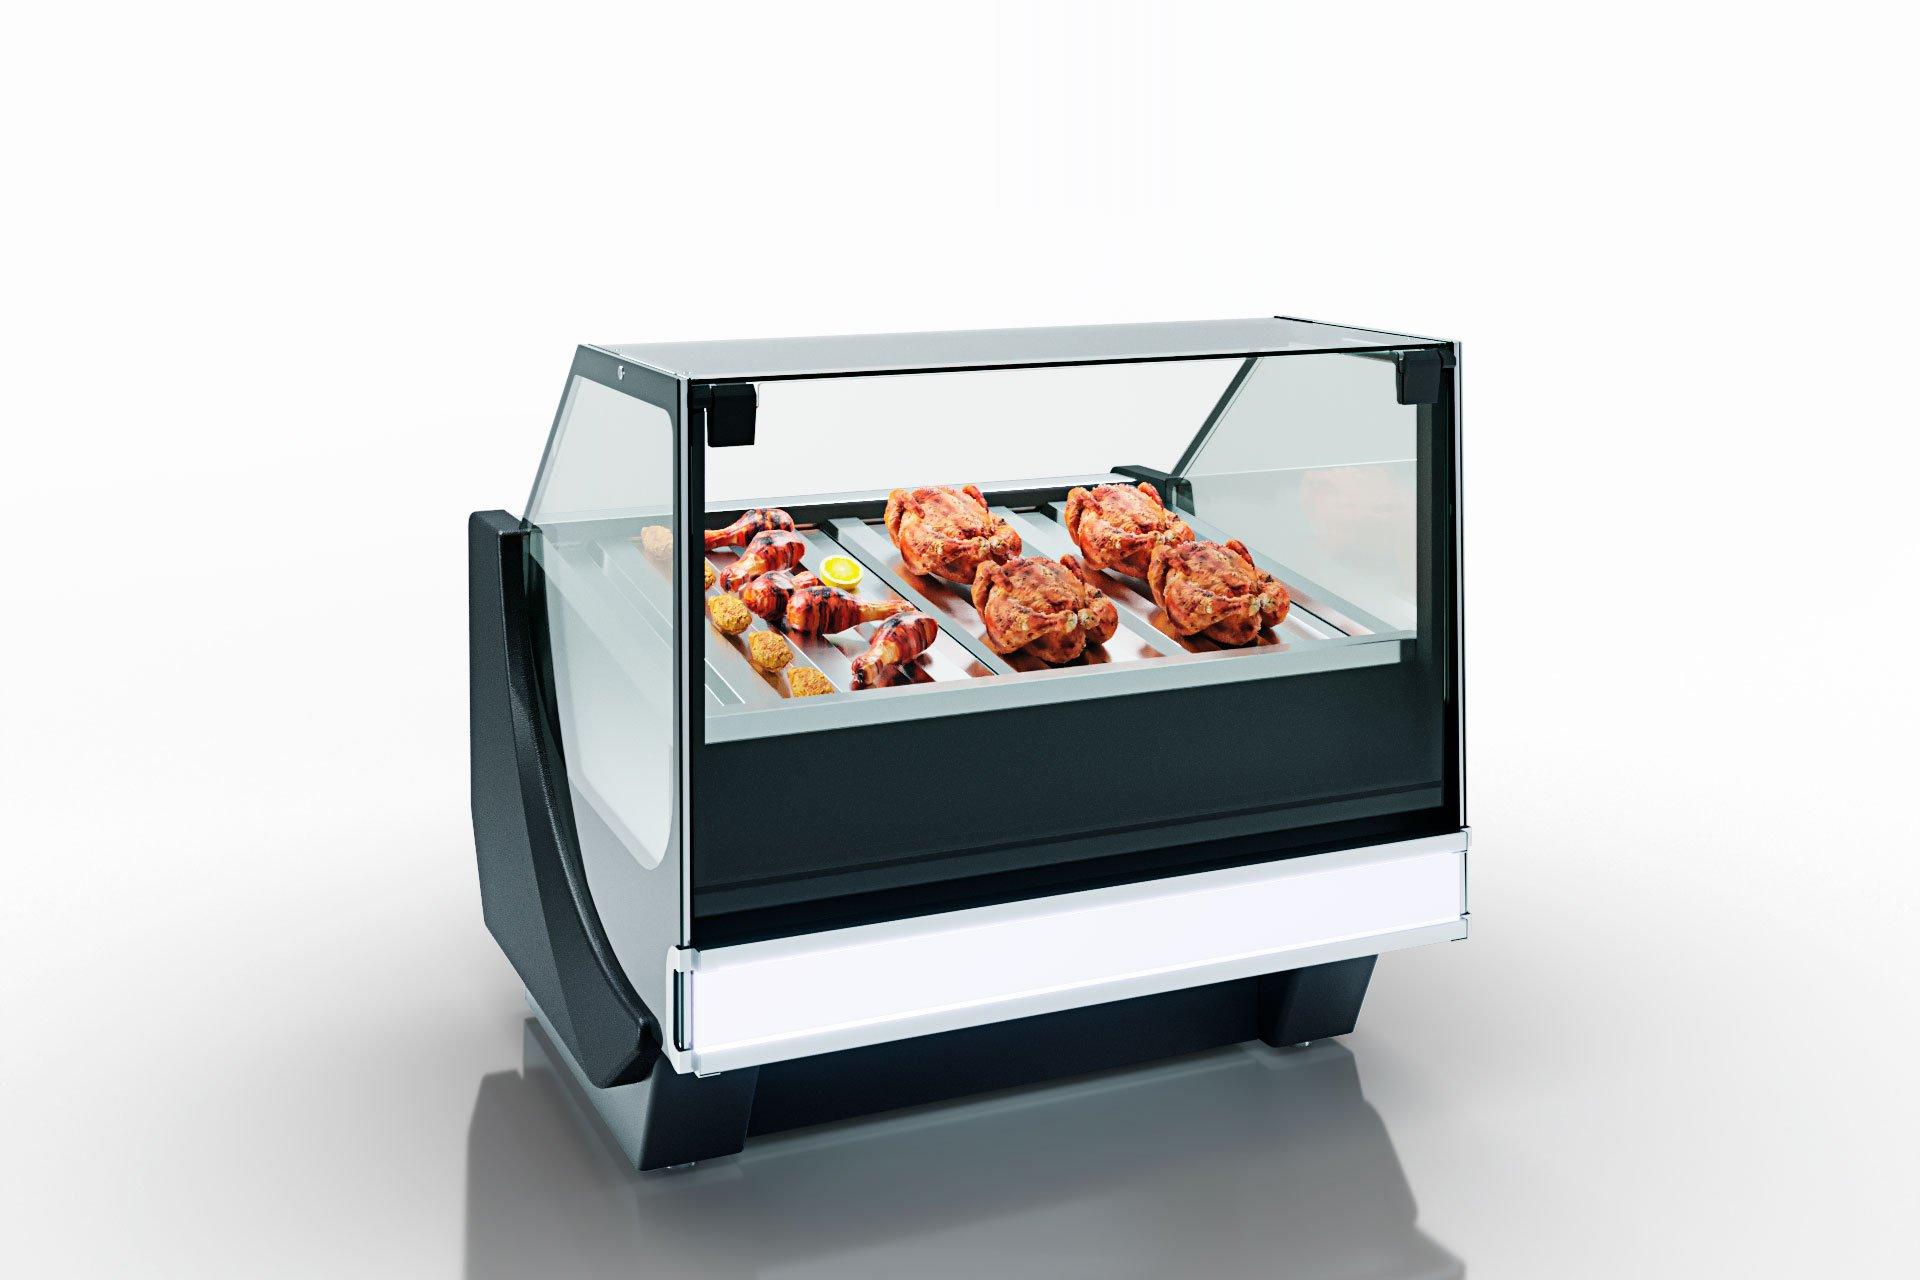 Wärme-Vitrine Missouri cold diamond NC 115 heat grill PS 121